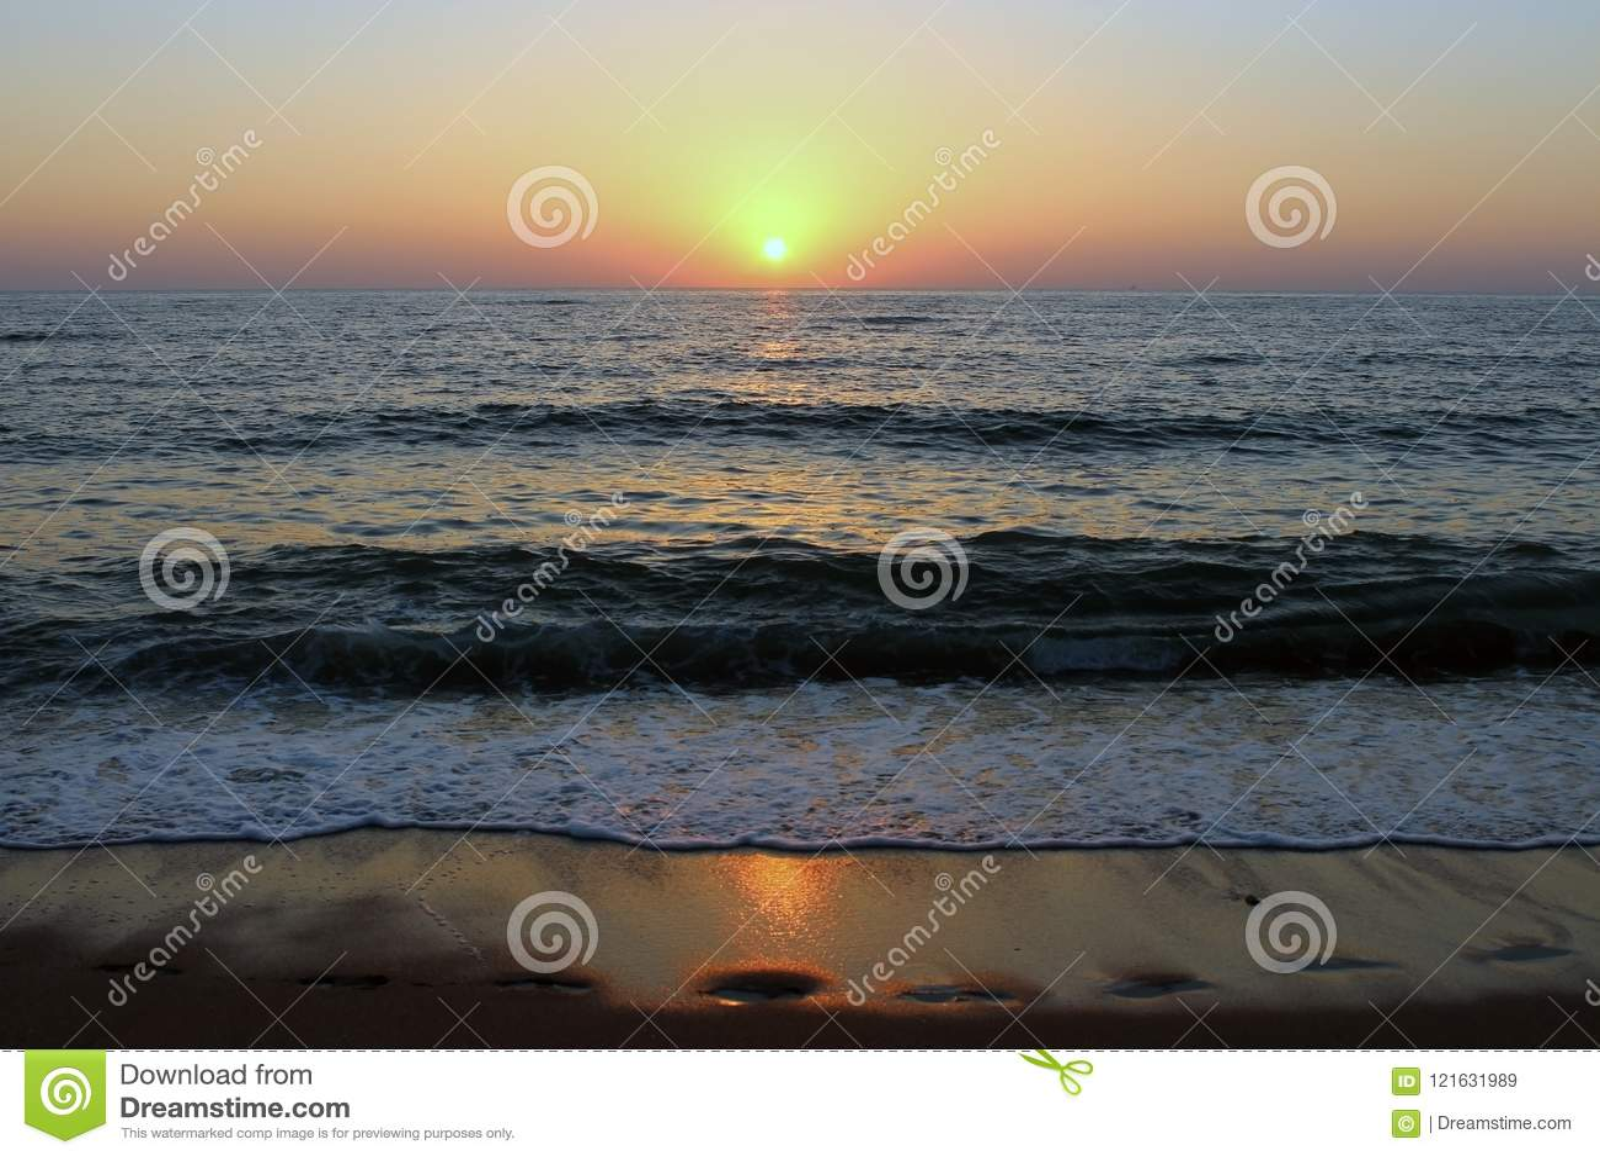 The Caspian sea at sunset